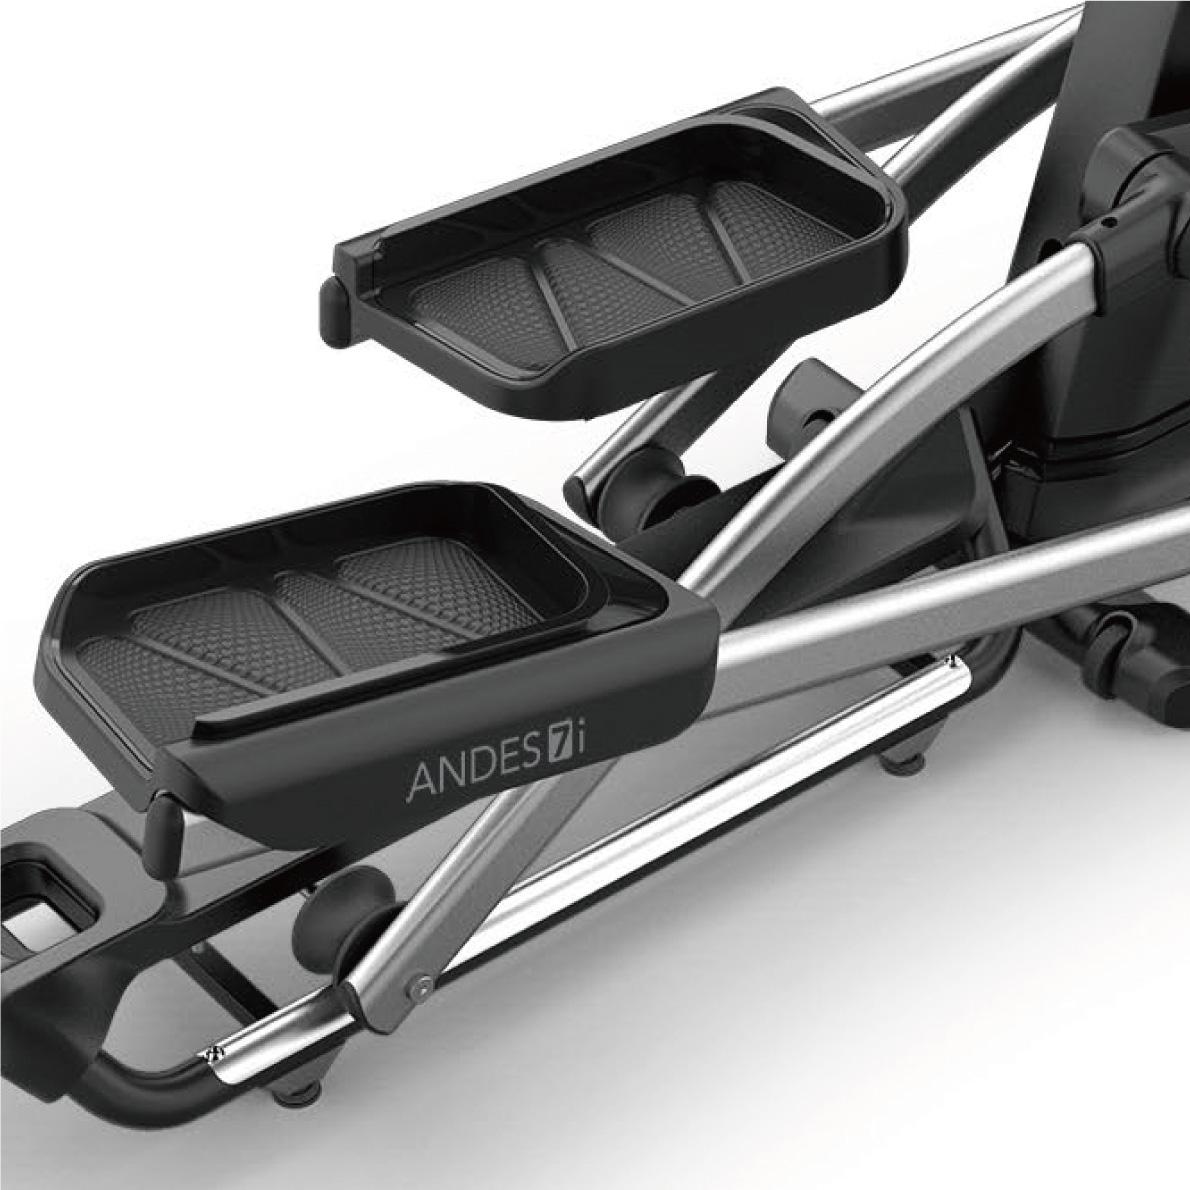 Andes7i/家庭用クロストレーナー《ジョンソンヘルステック》